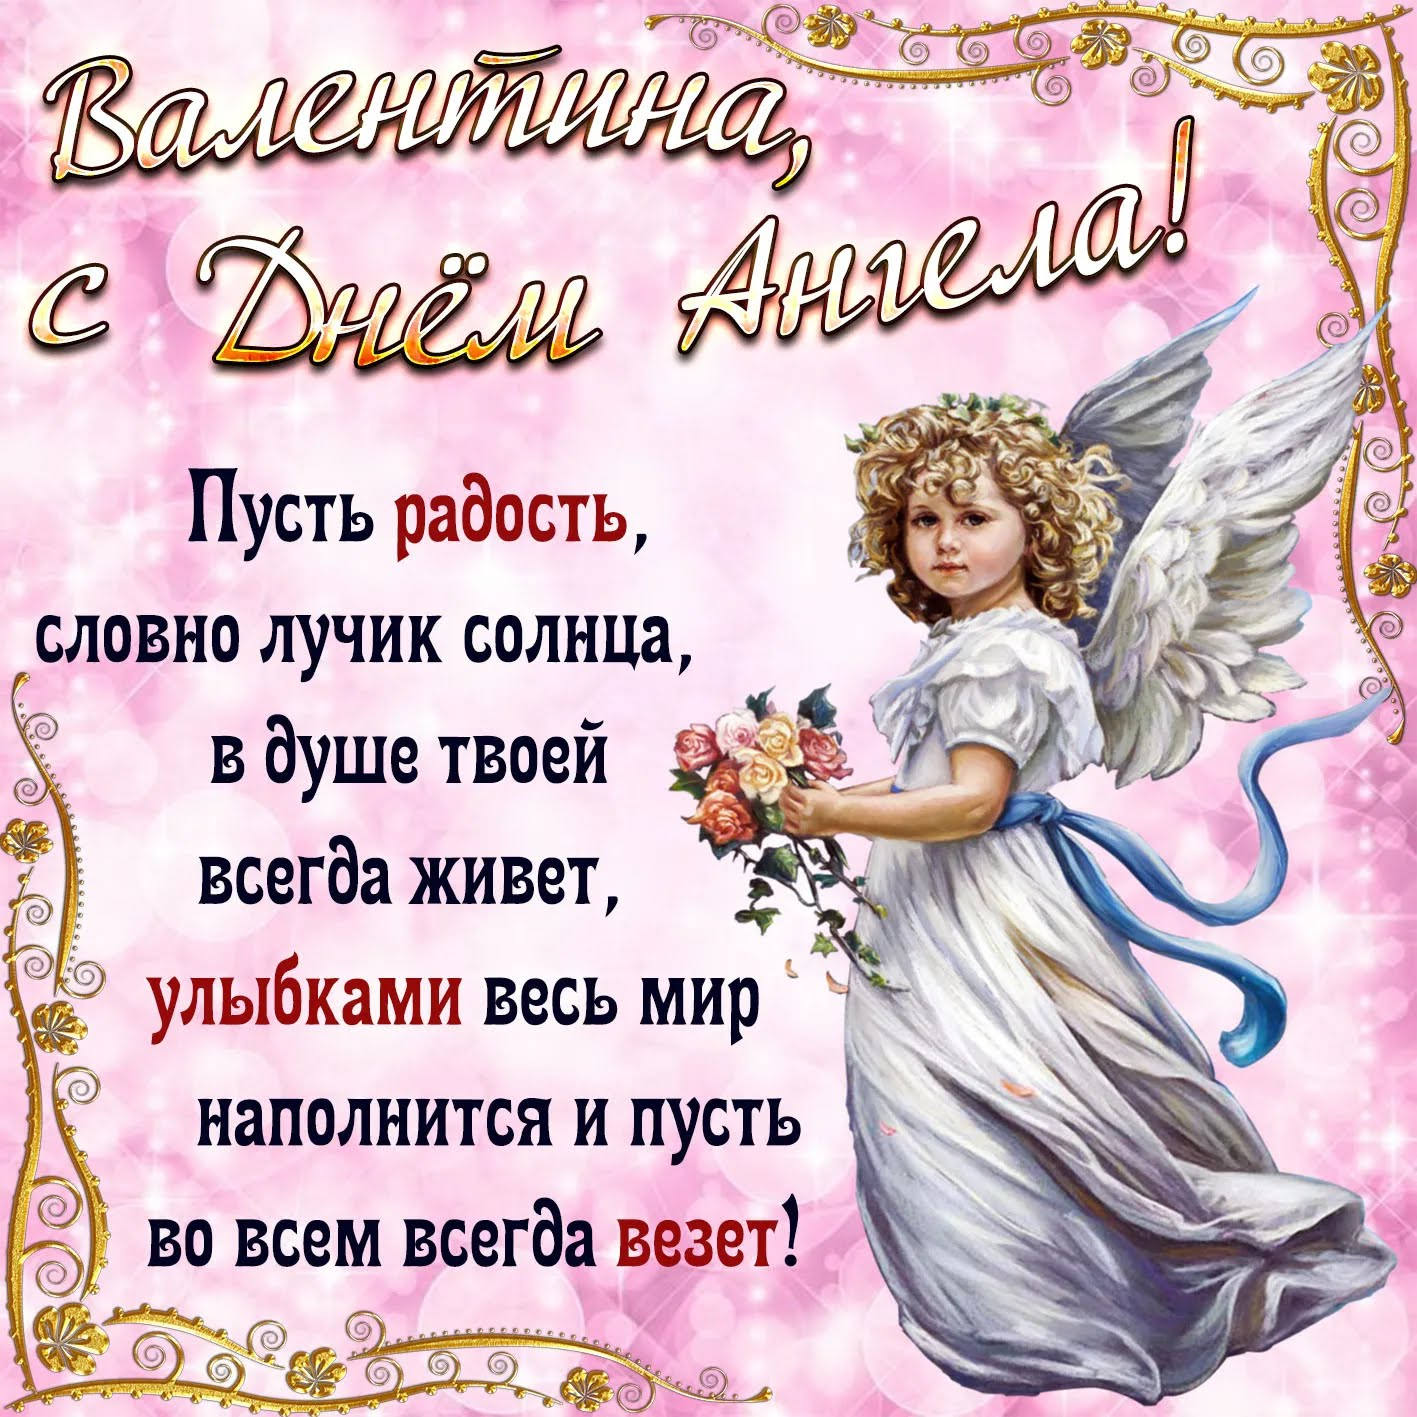 День ангела Валентина